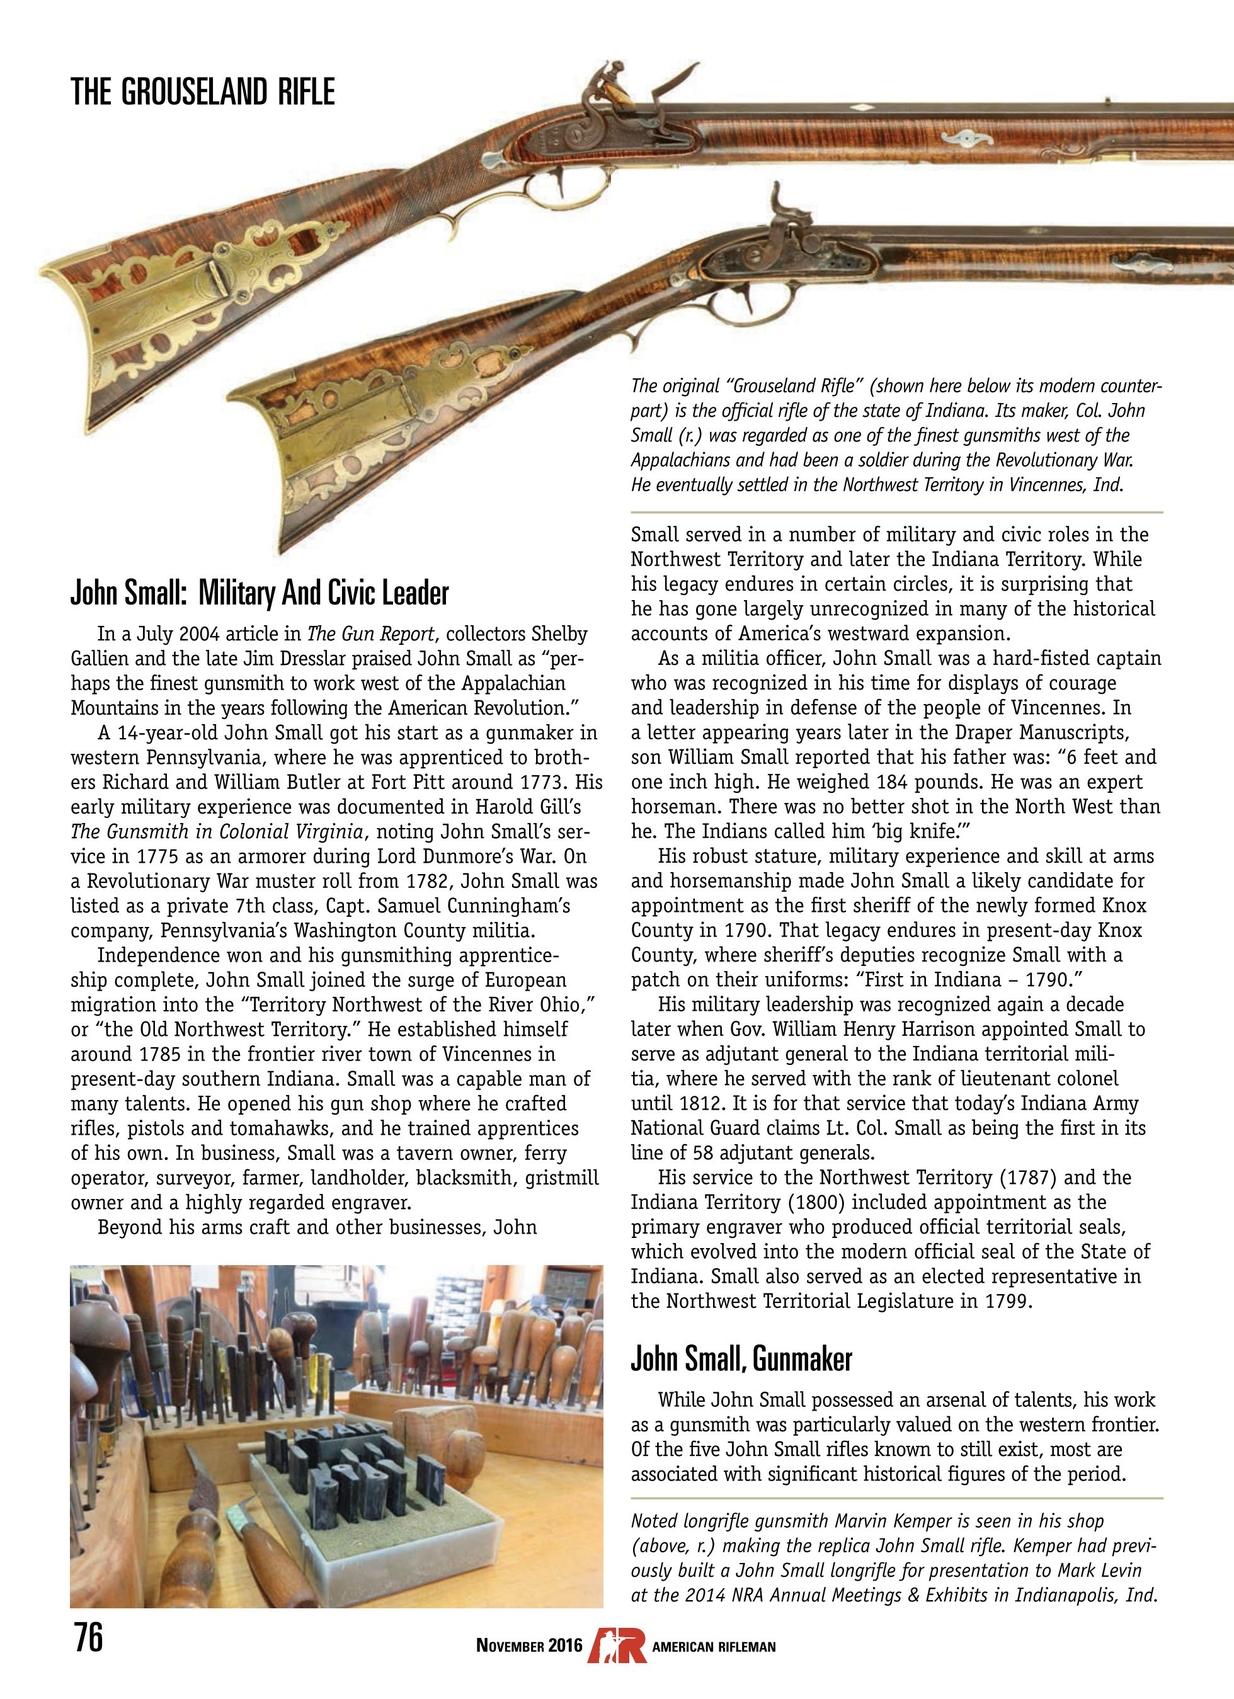 American Rifleman - November 2016